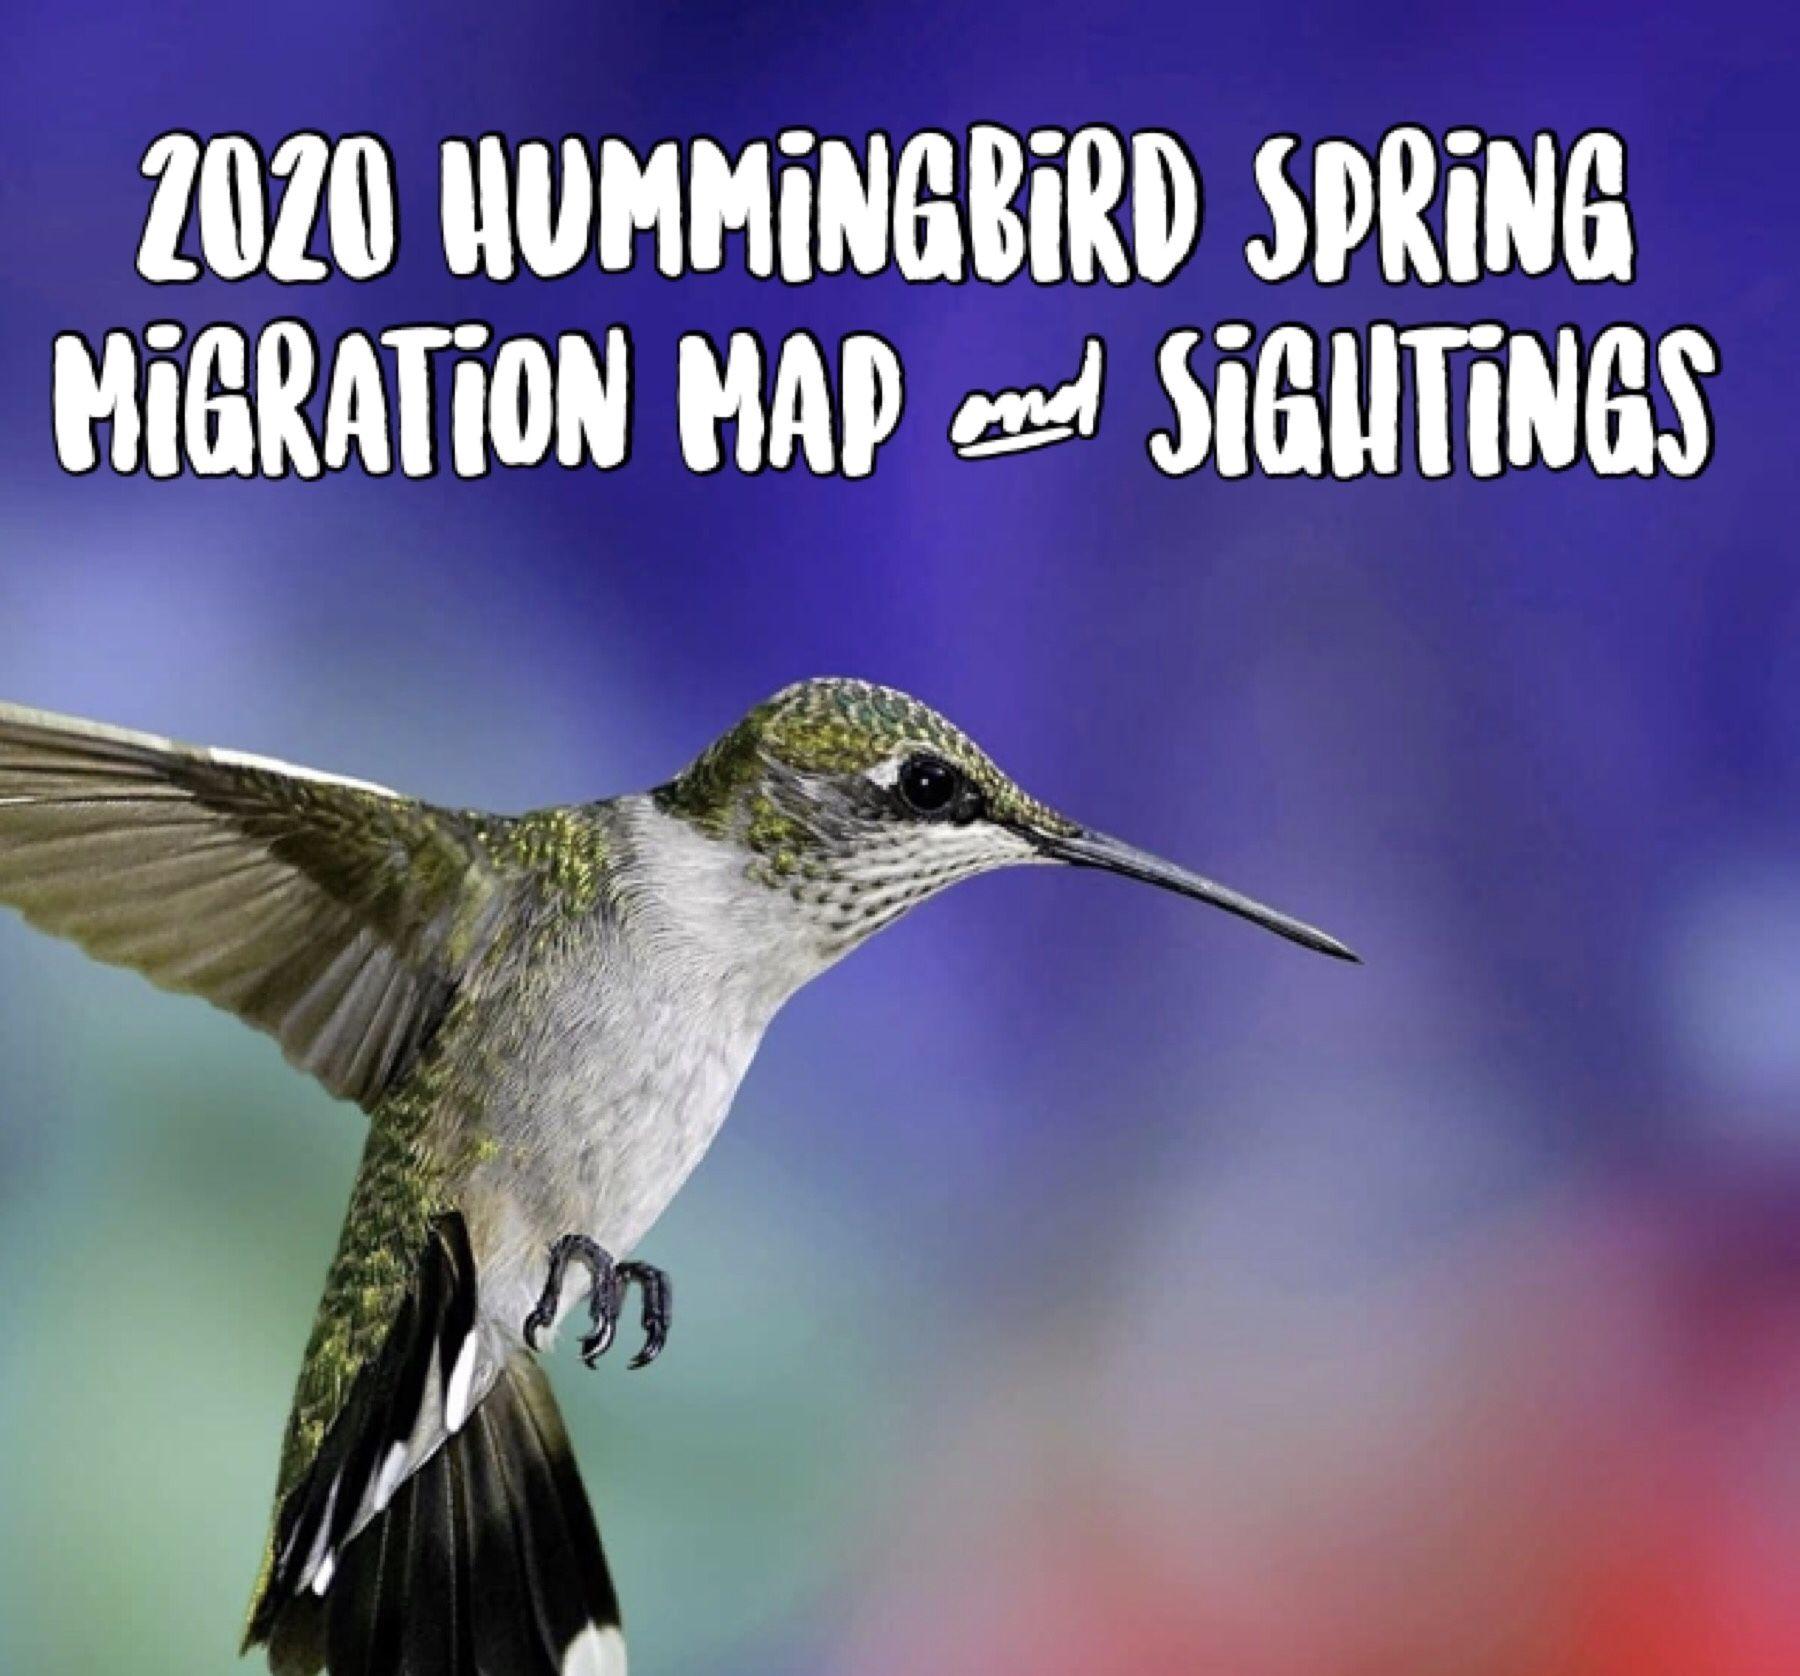 2020 Hummingbird Migration Map in 2020 Hummingbird